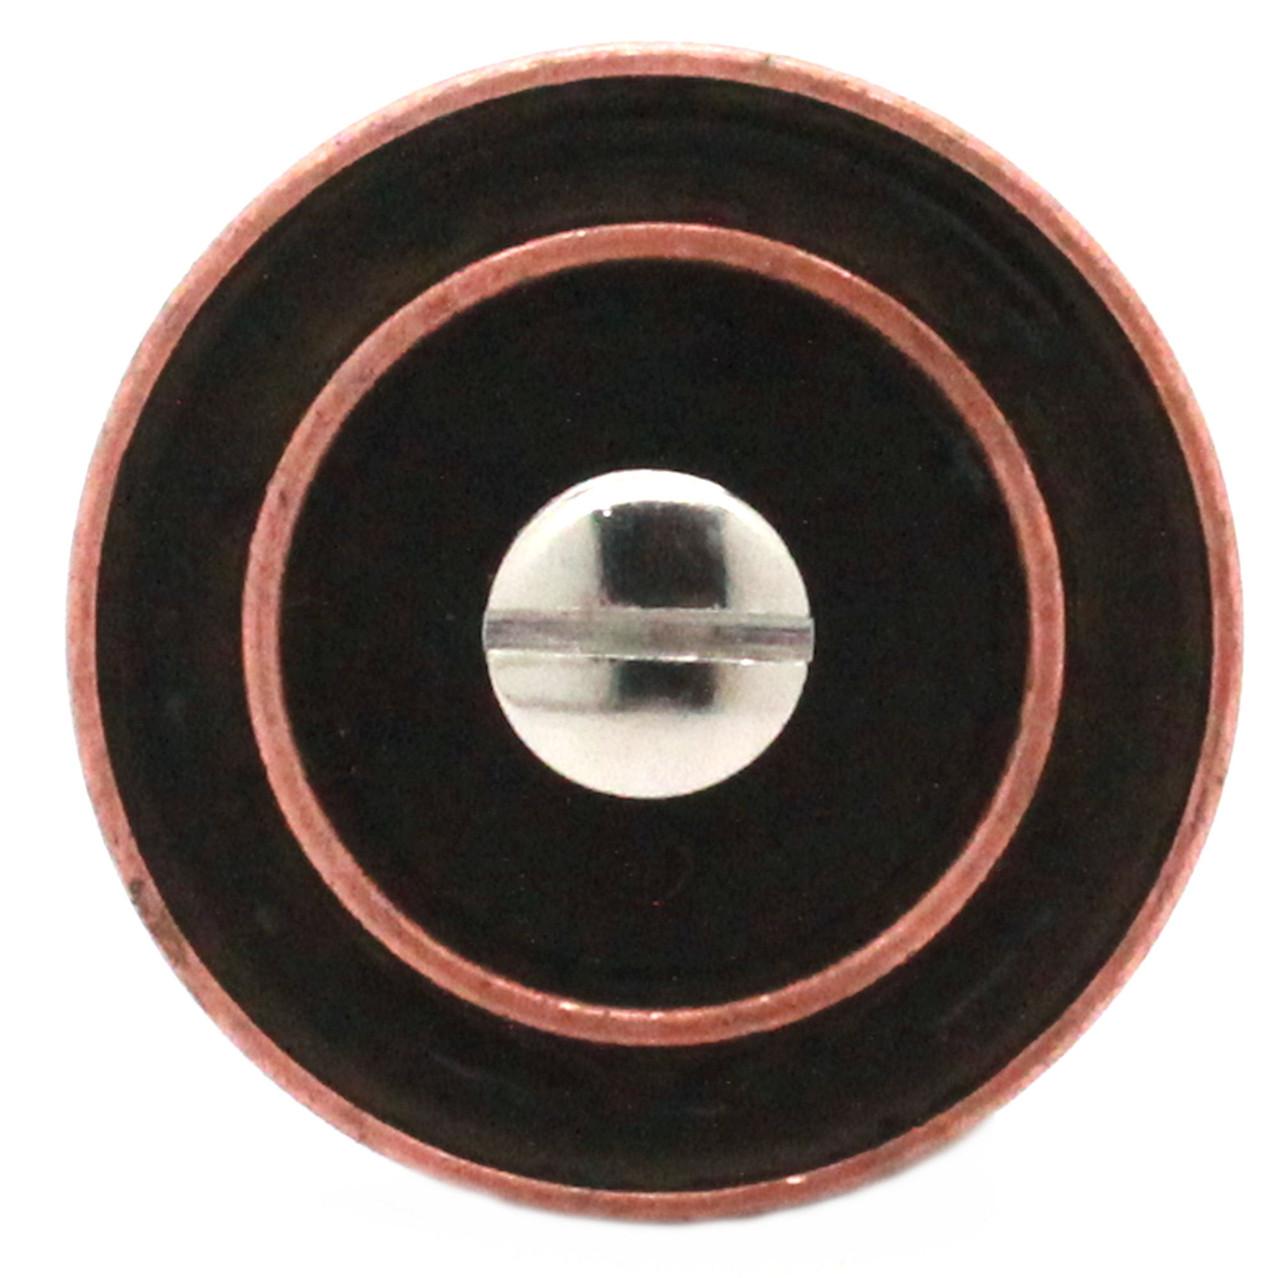 Button Concho Rope Edge Antique Copper 1.5 Inch Back